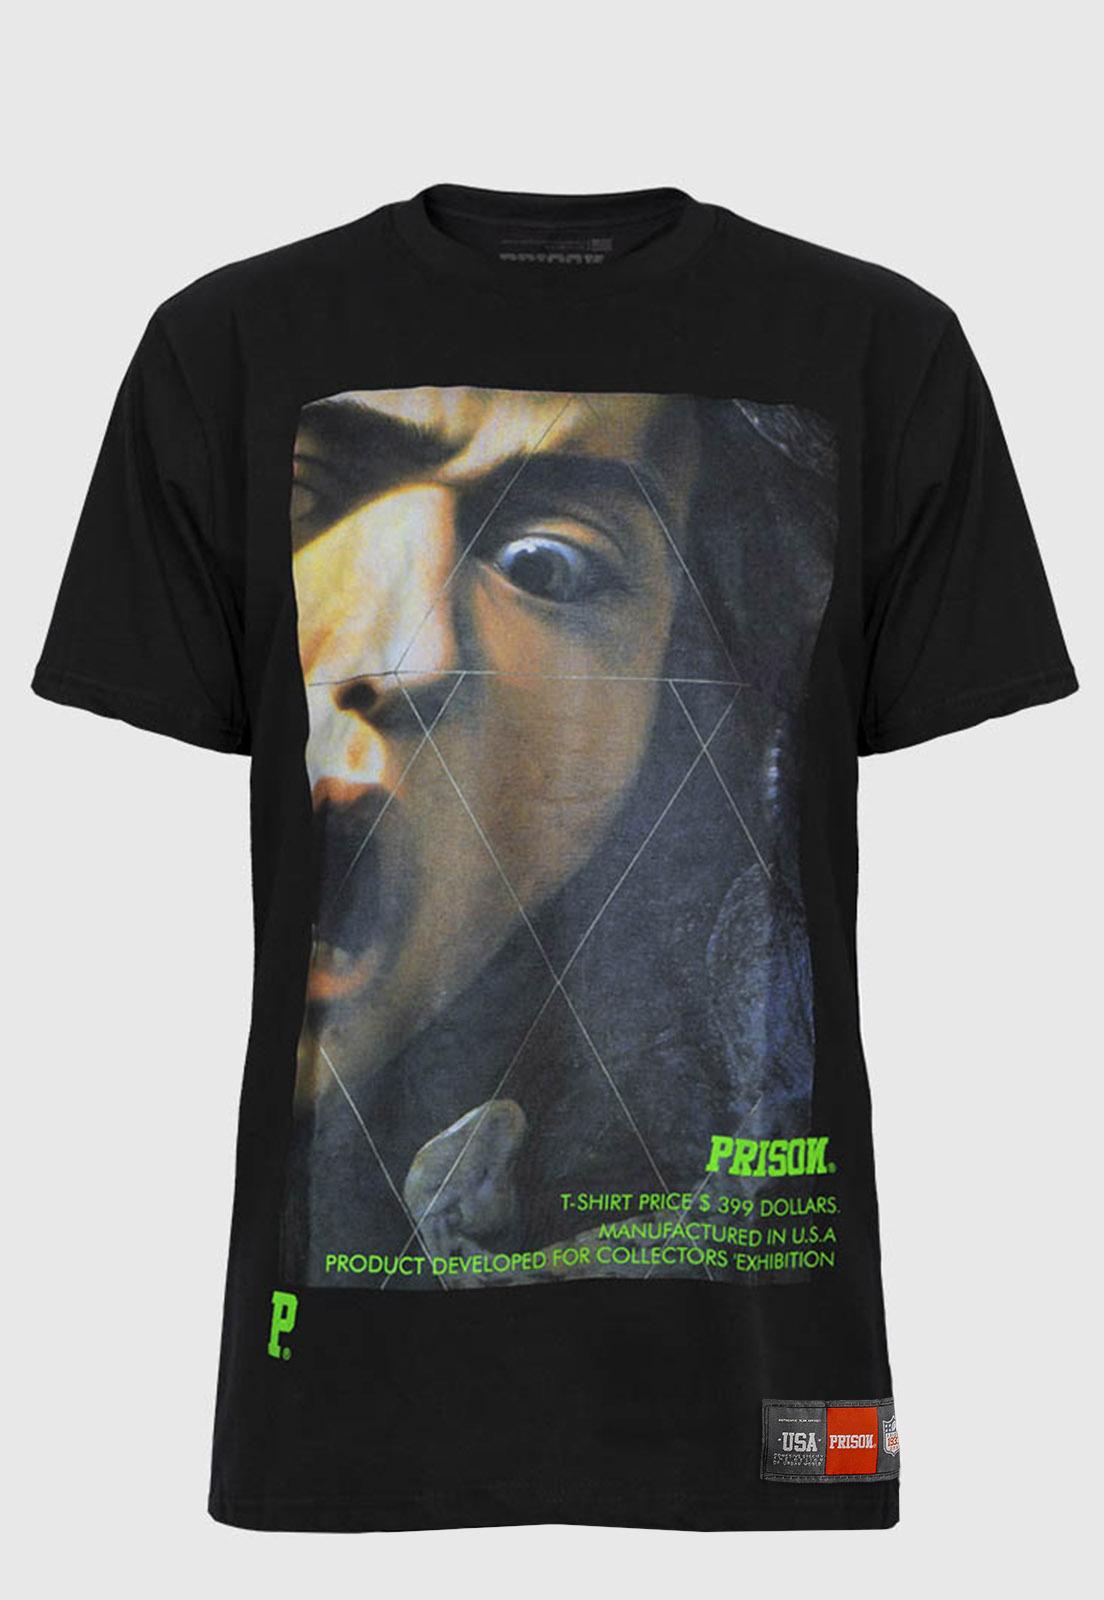 Camiseta Streetwear Prison Medusa